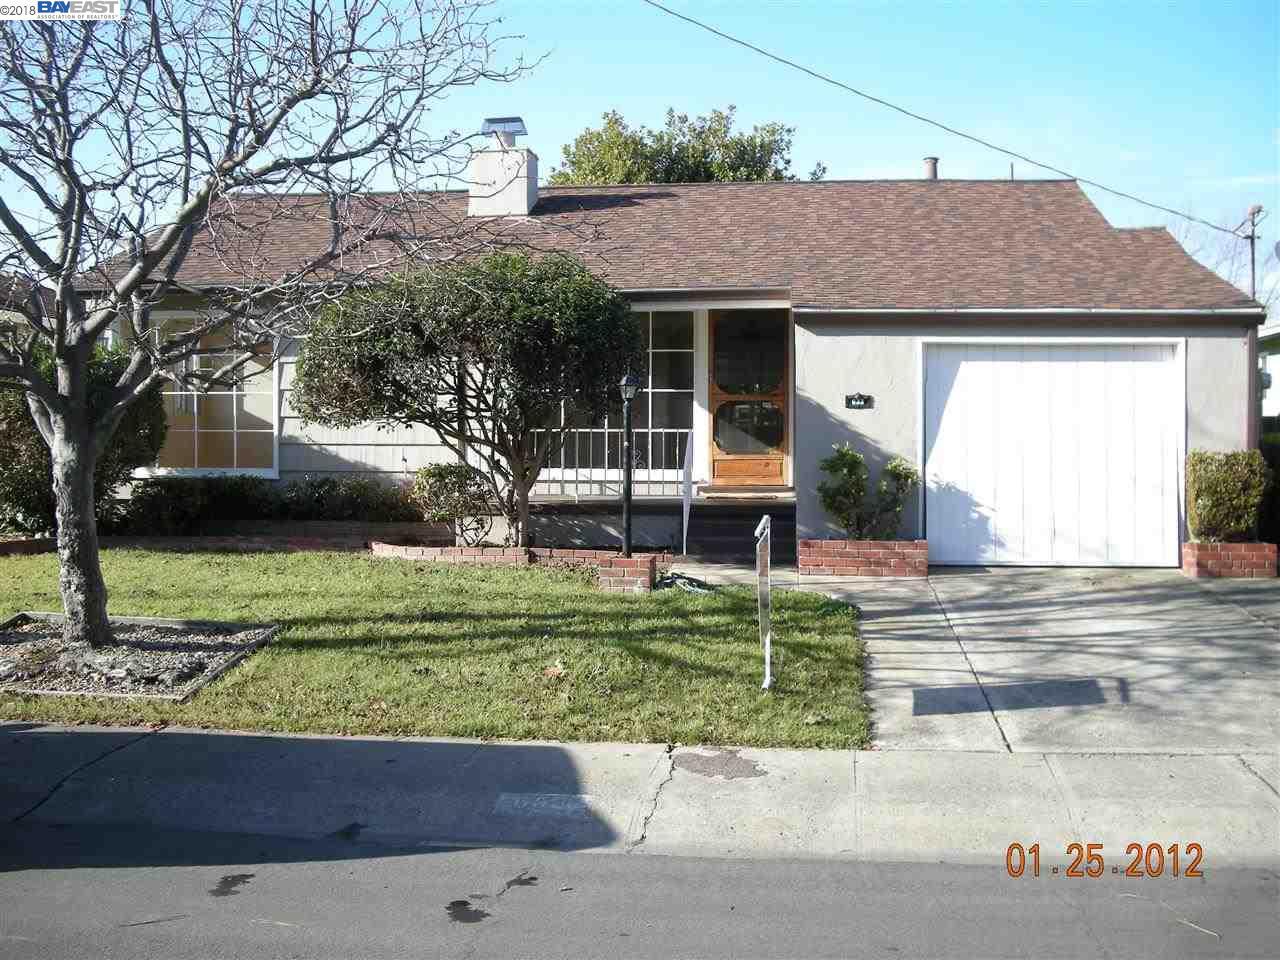 Single Family Home for Rent at 633 VIA ALAMO 633 VIA ALAMO San Lorenzo, California 94580 United States